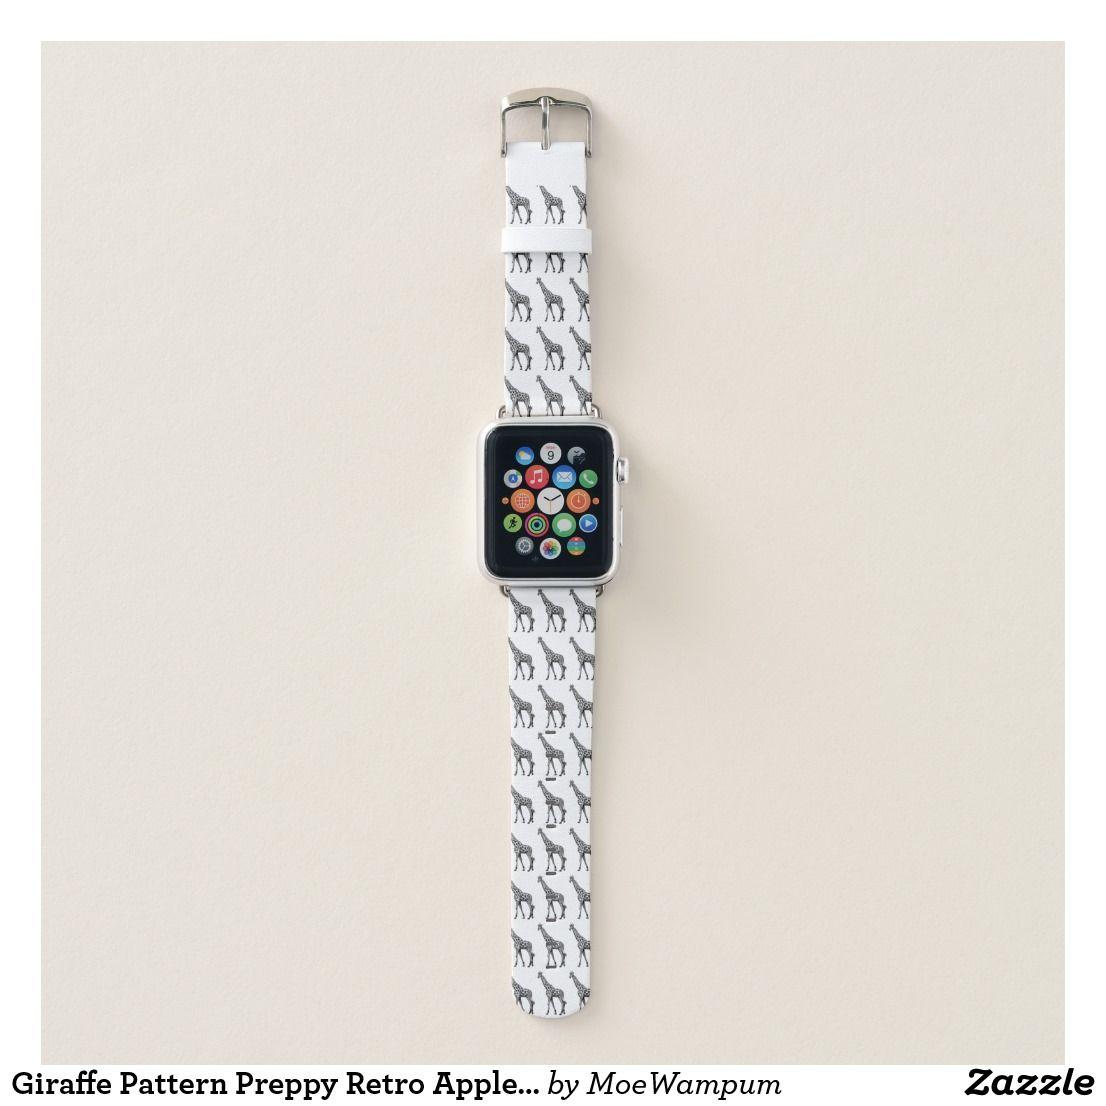 Giraffe Pattern Preppy Retro Apple Watch Band Zazzle Com With